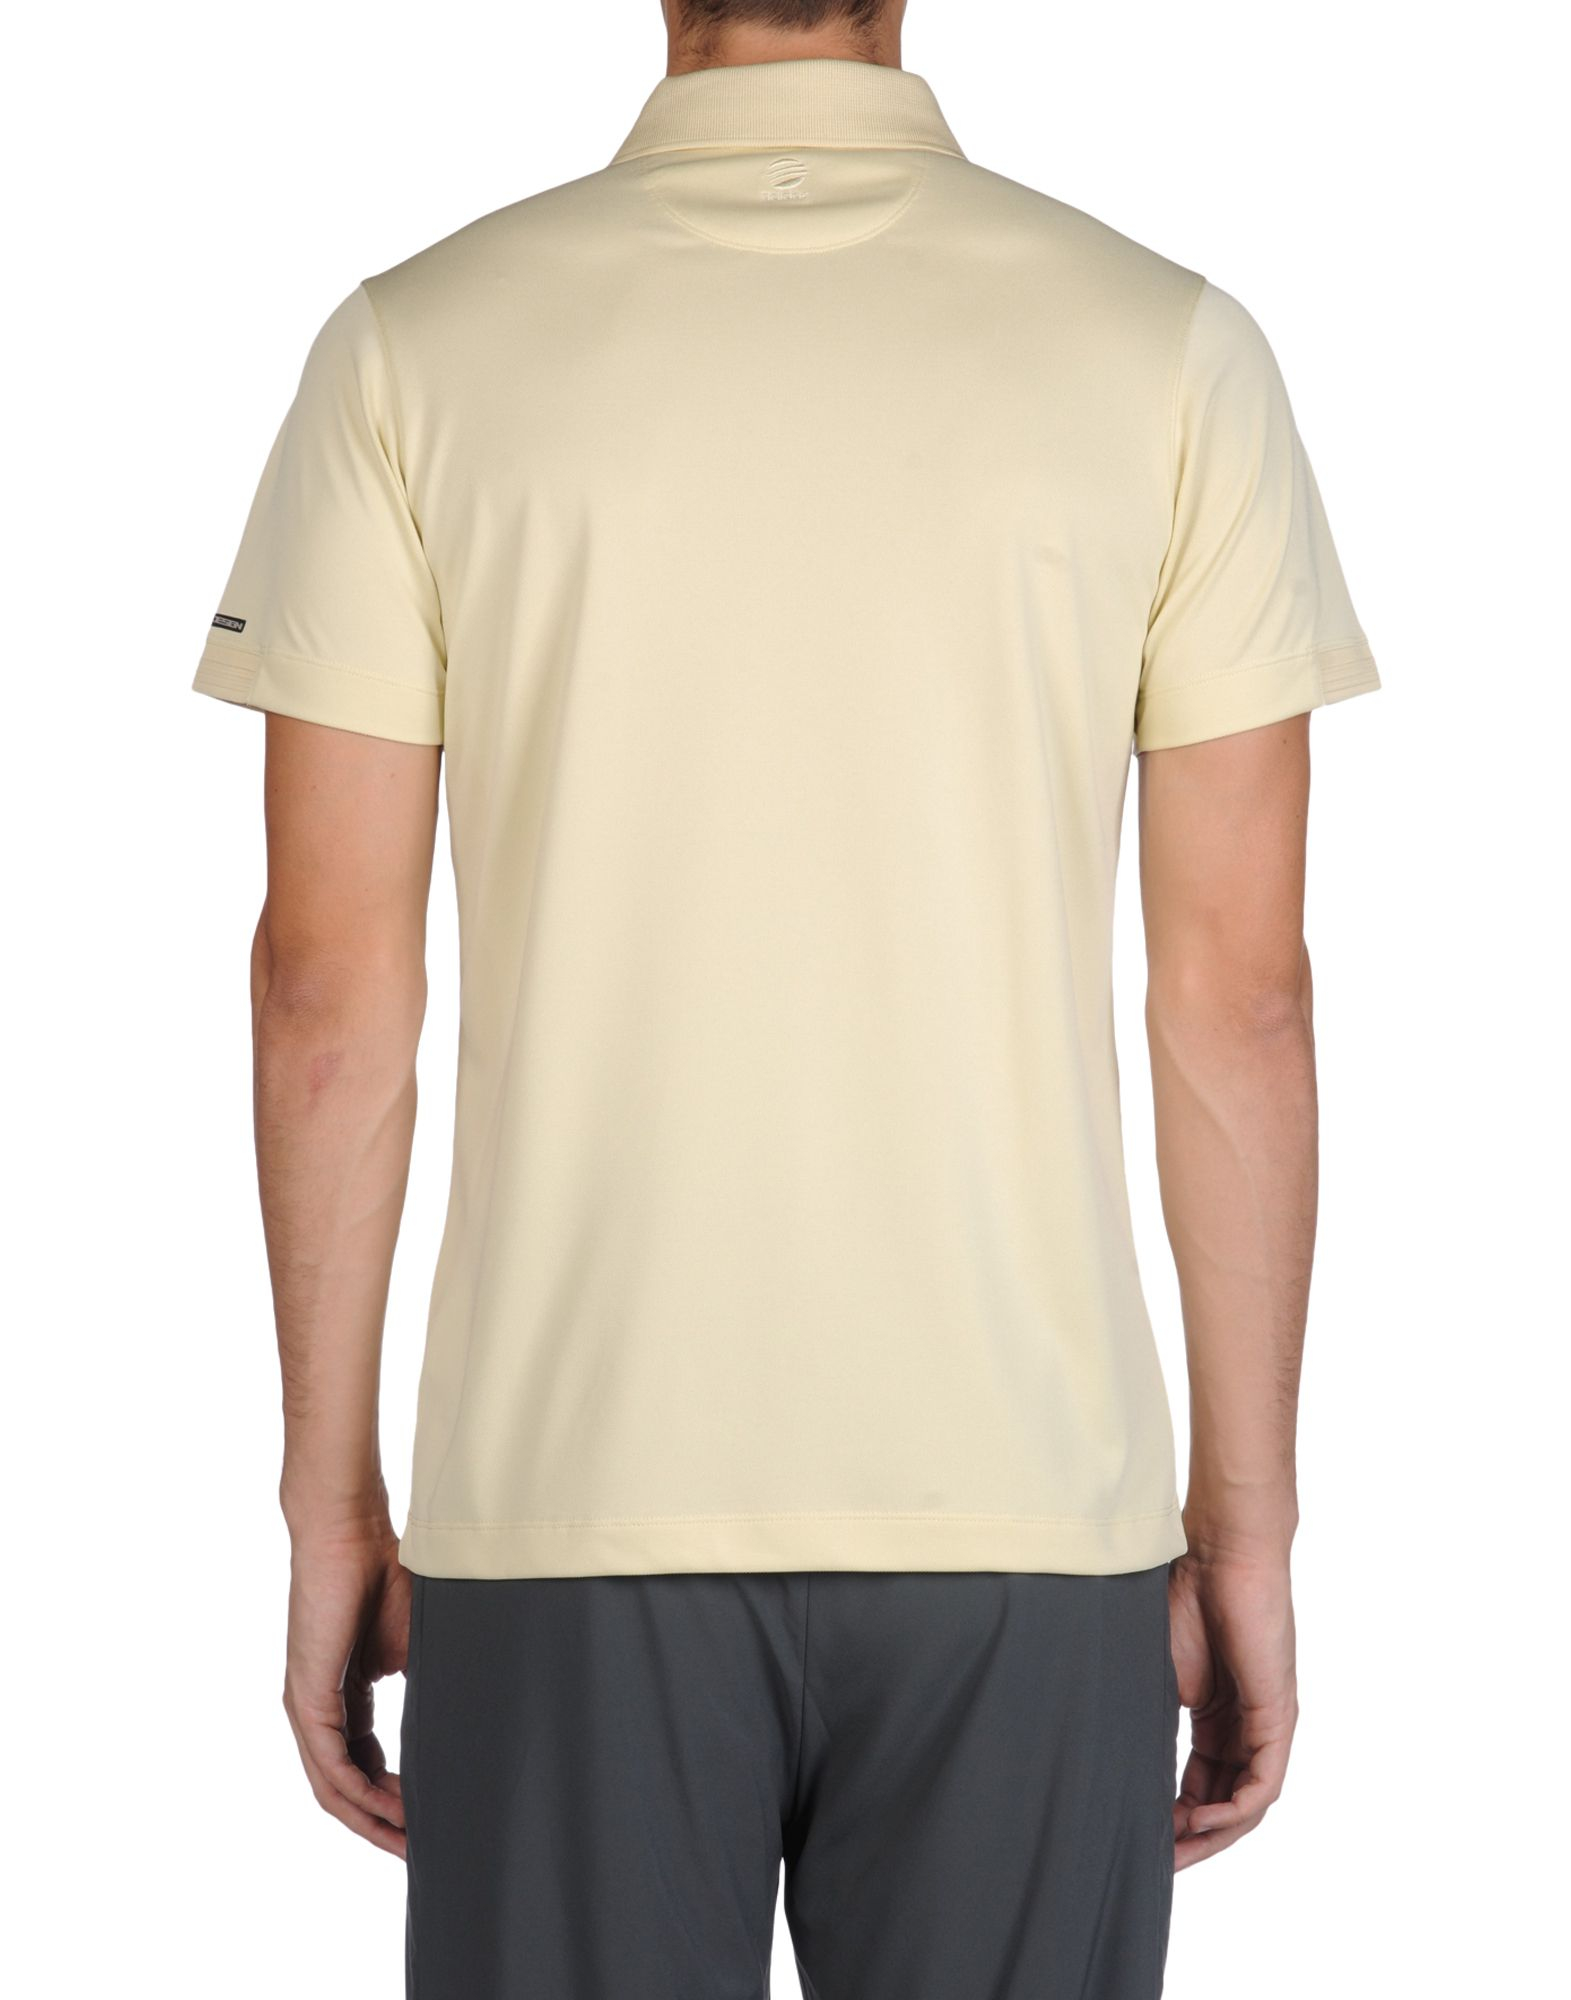 porsche design sport by adidas polo shirt in beige for men. Black Bedroom Furniture Sets. Home Design Ideas